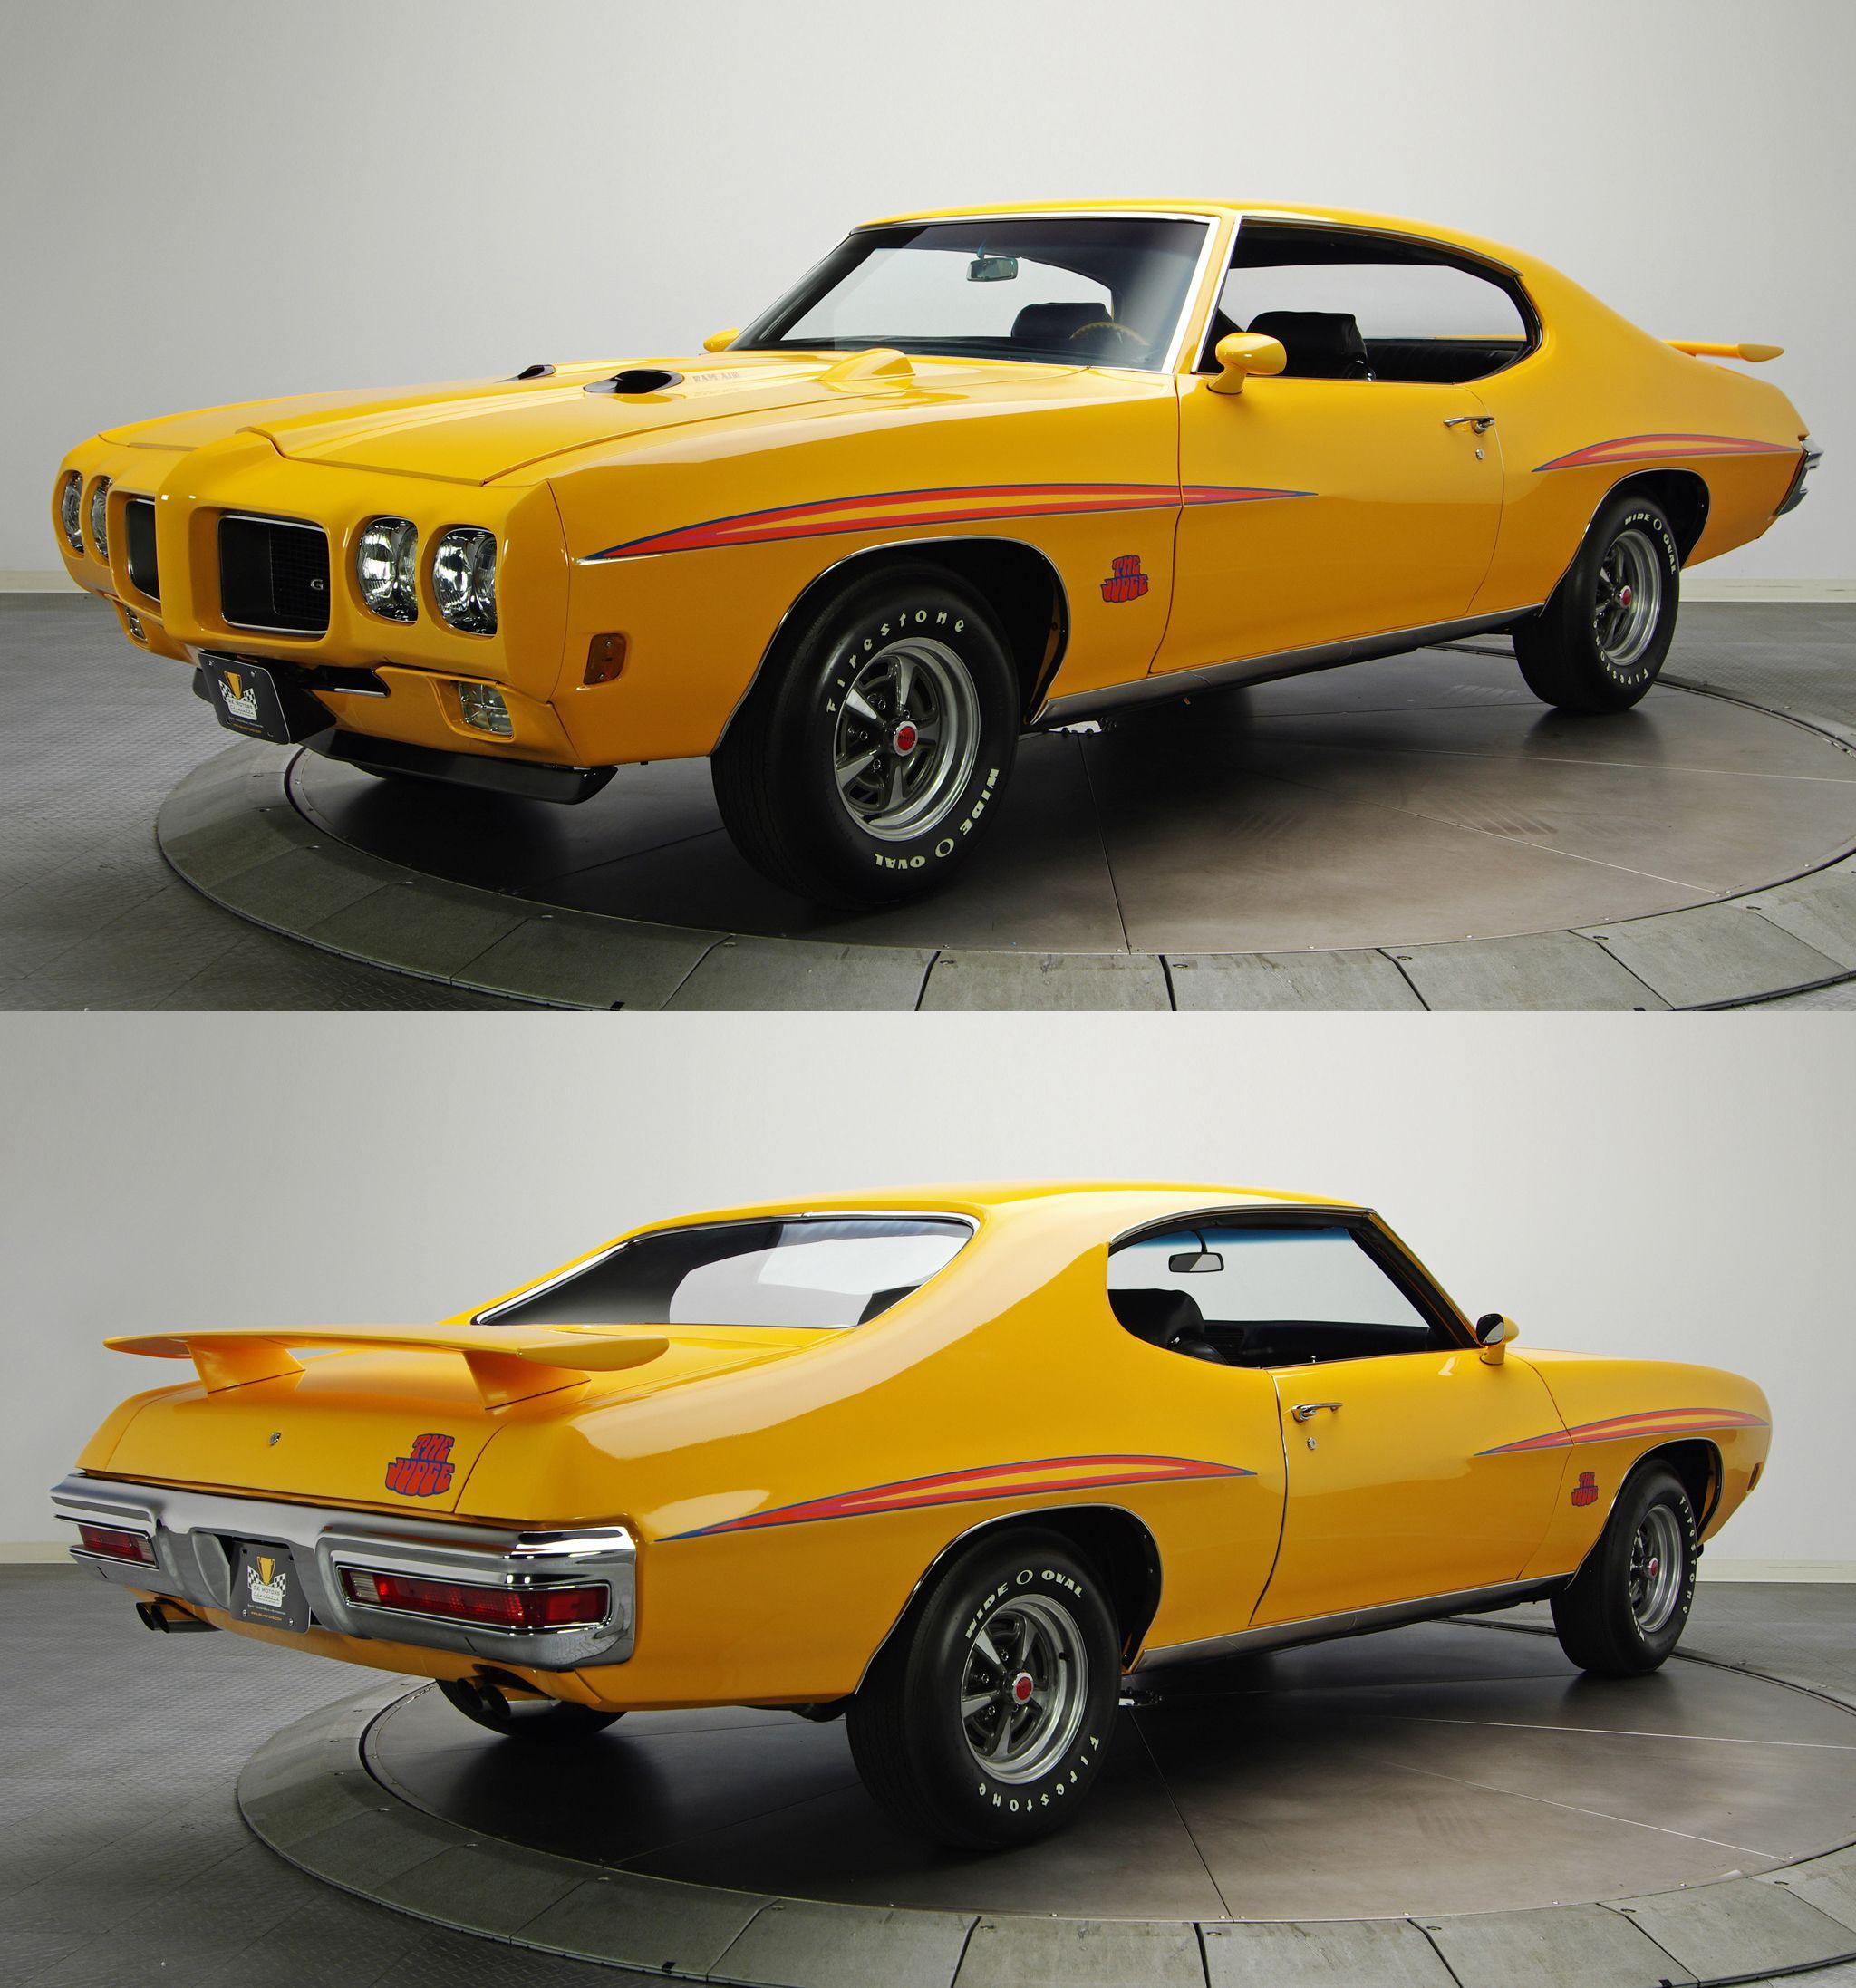 1970 Pontiac Gto Judge Re Pin Brought To You By Carinsurance Eugeneoregon And Houseofinsurance Pontiac Gto Gto Pontiac